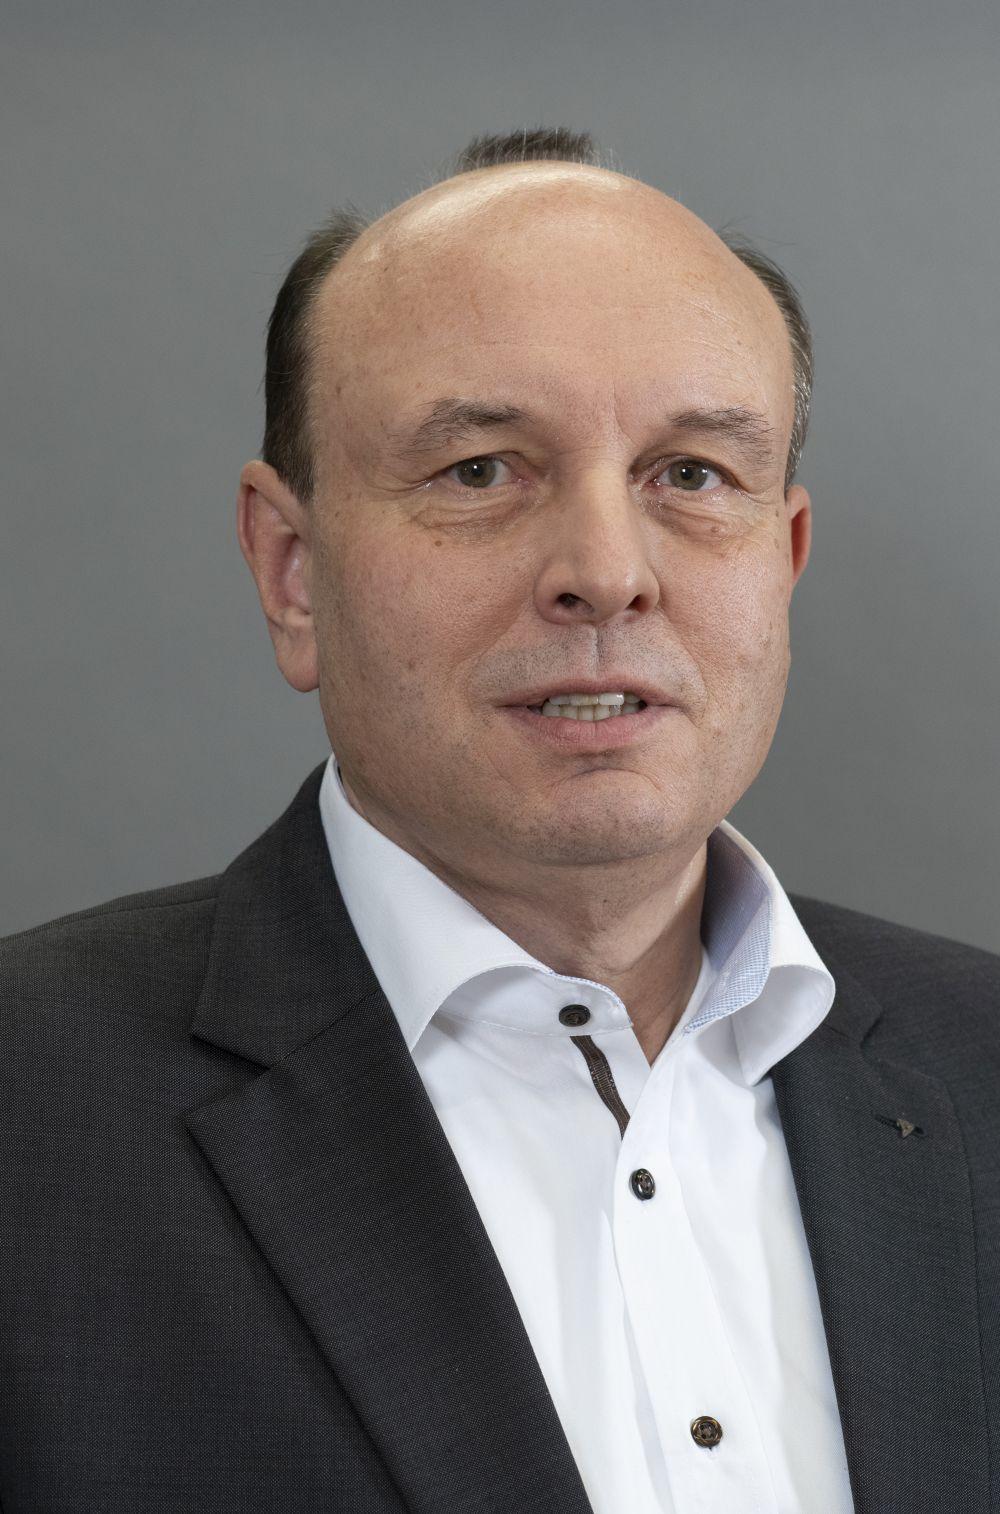 Jörg-Timm Kilisch, Managing Director DEKRA Testing & Certification. Photo: Thomas Kienzle